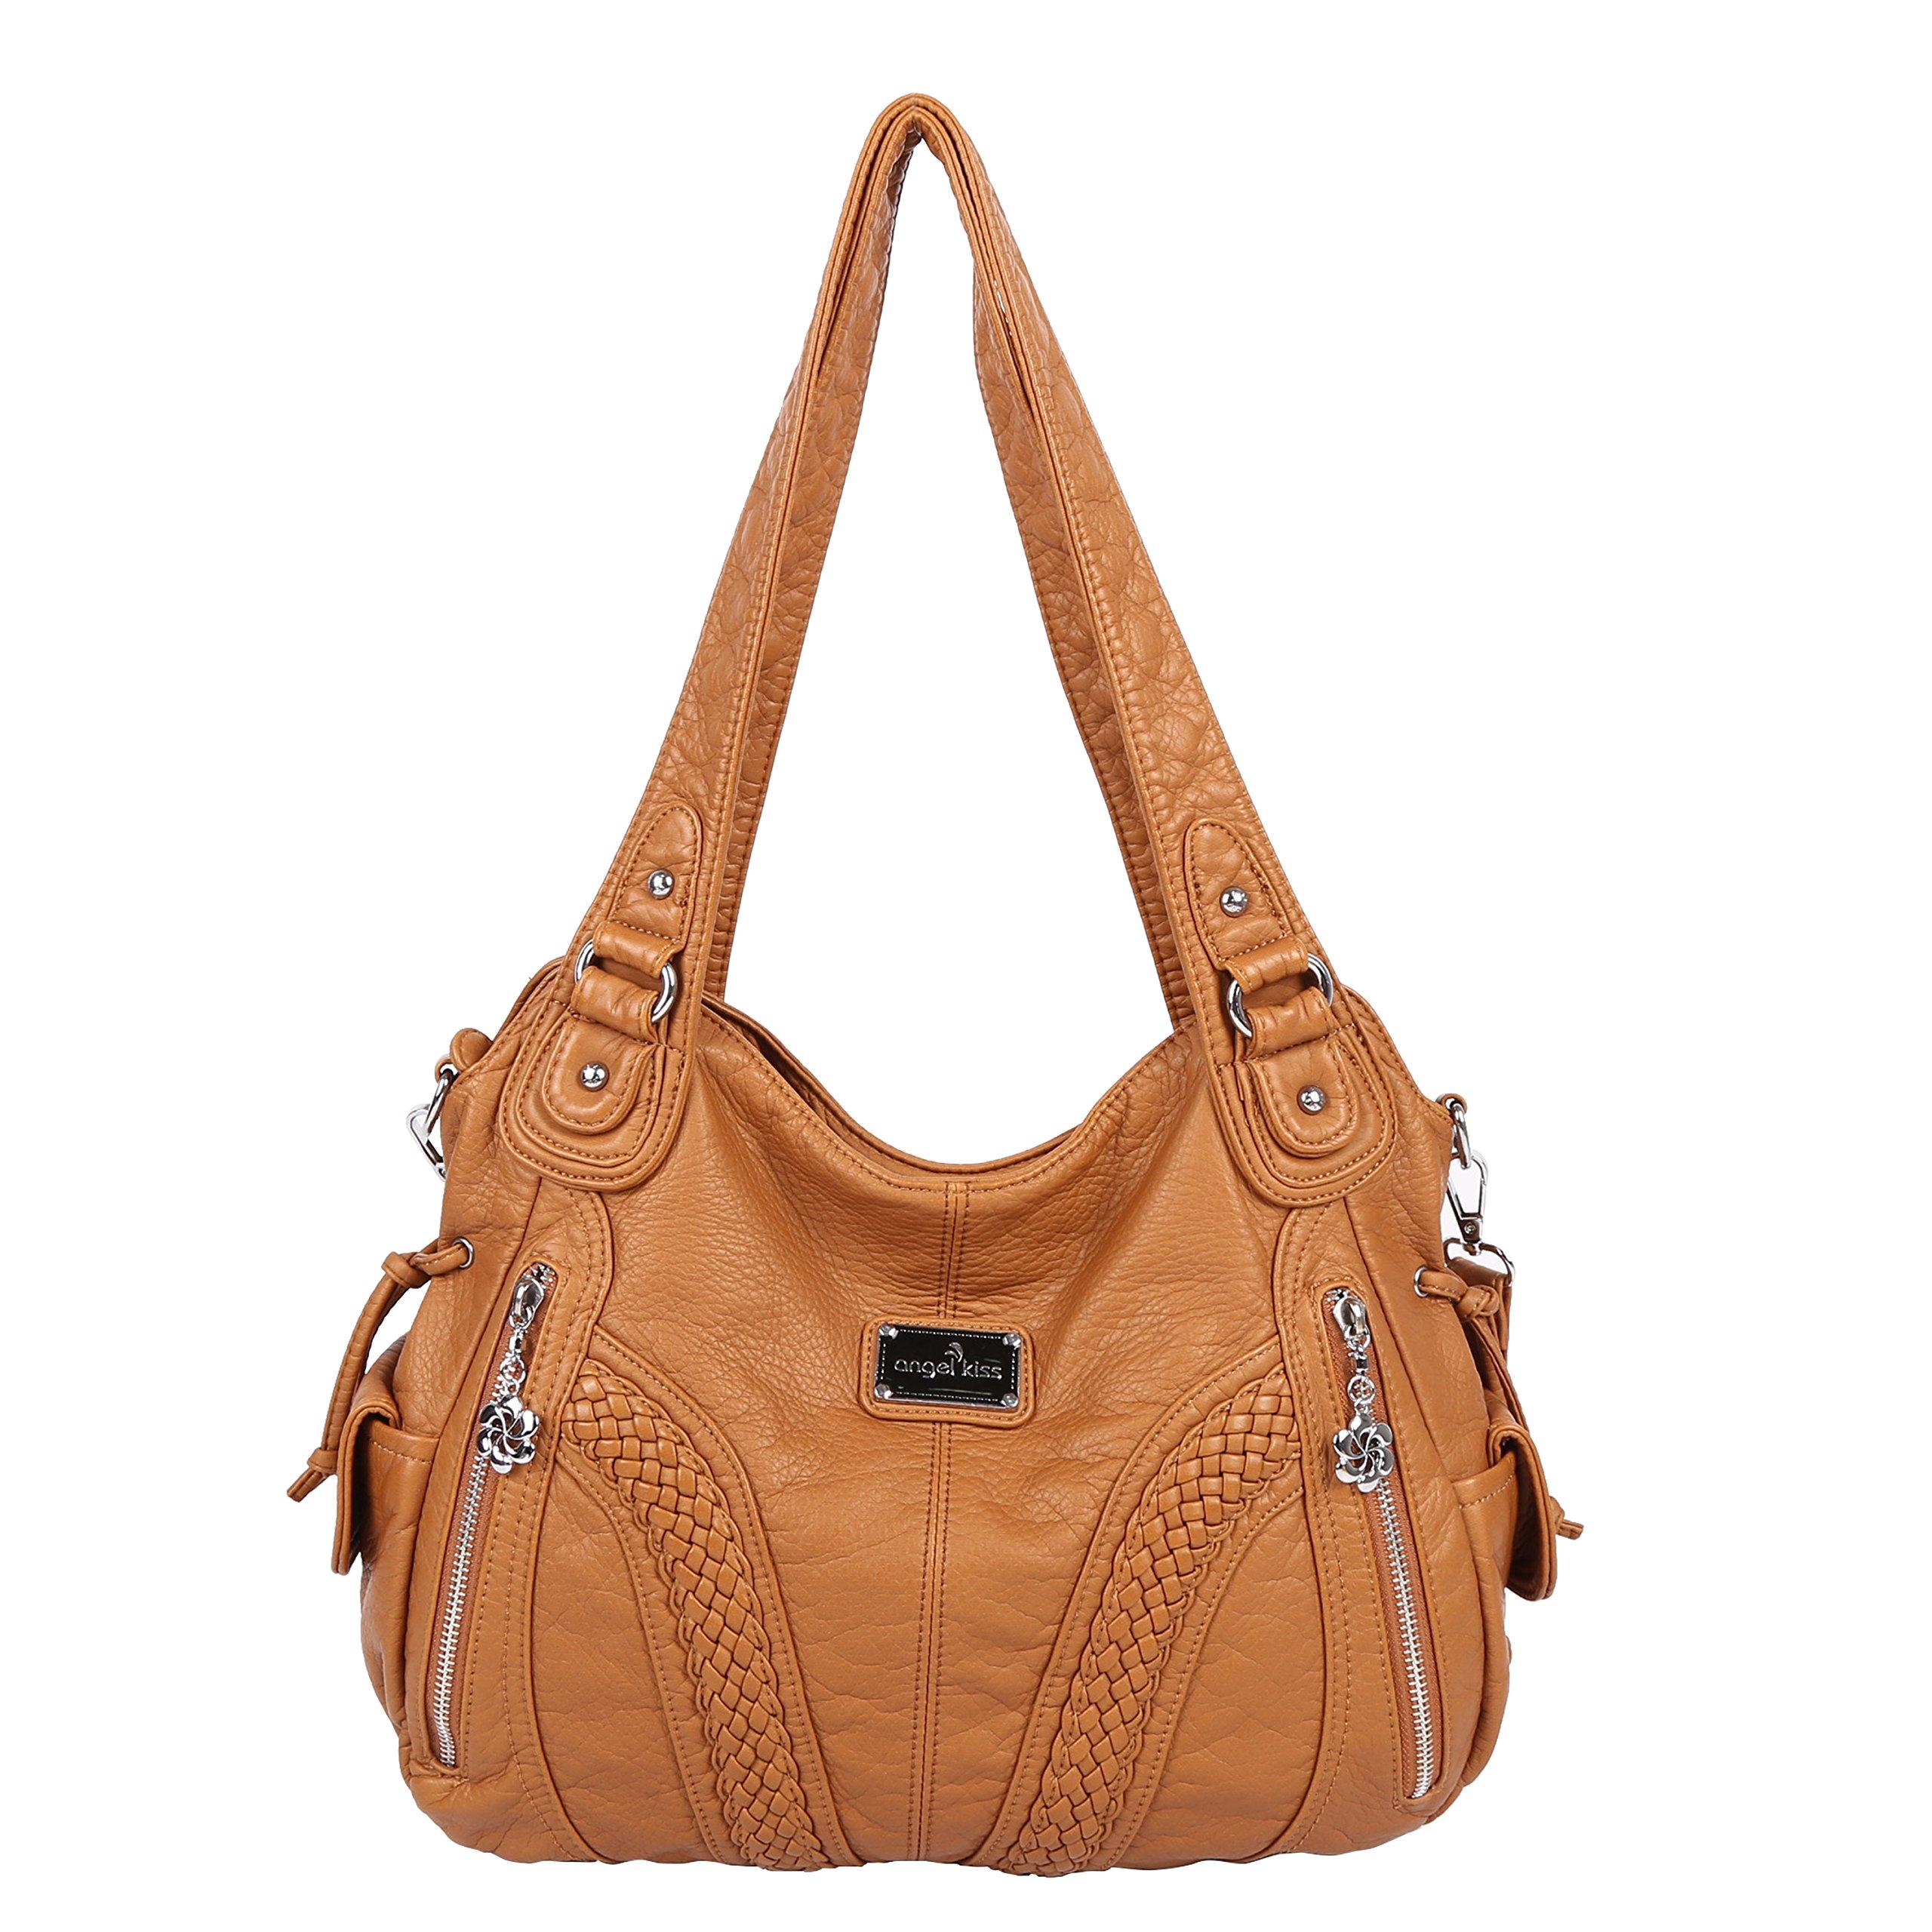 Angelkiss Women Top Handle Satchel Handbags Shoulder Bag Messenger Tote Washed Leather Purses Bag (L-Brown)